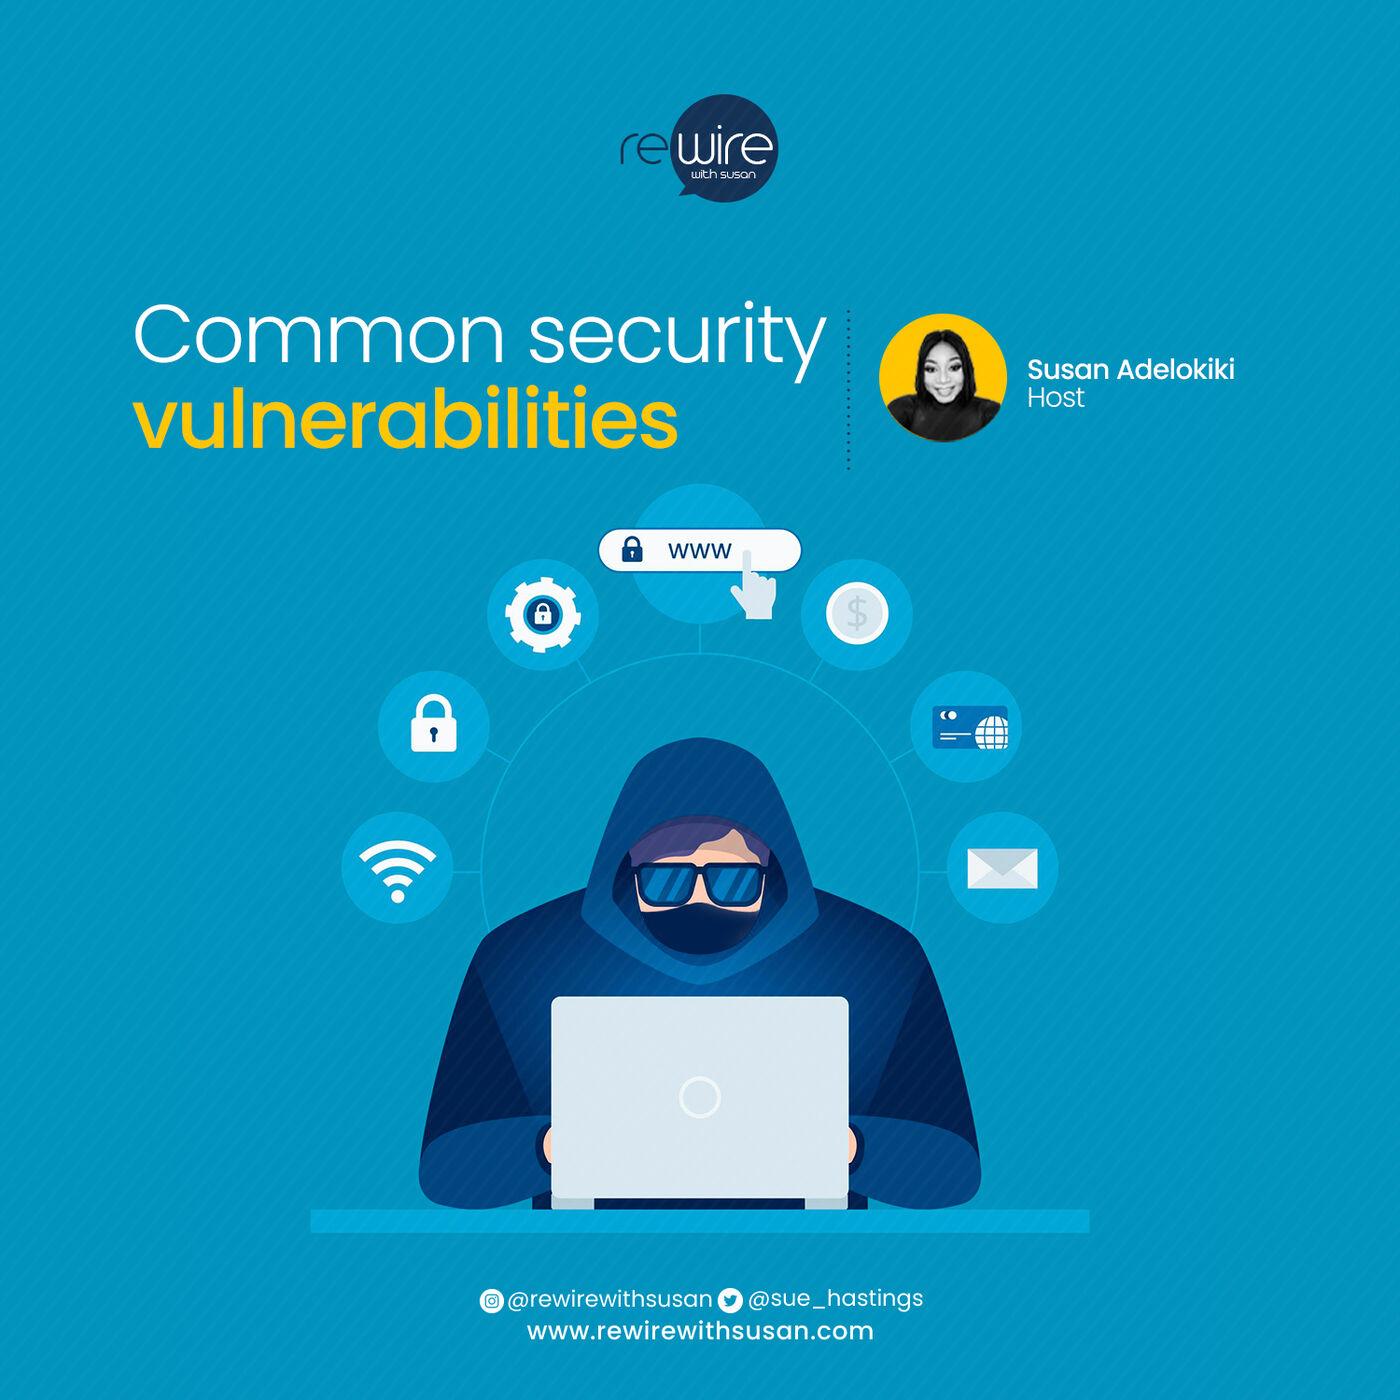 Common security vulnerabilities